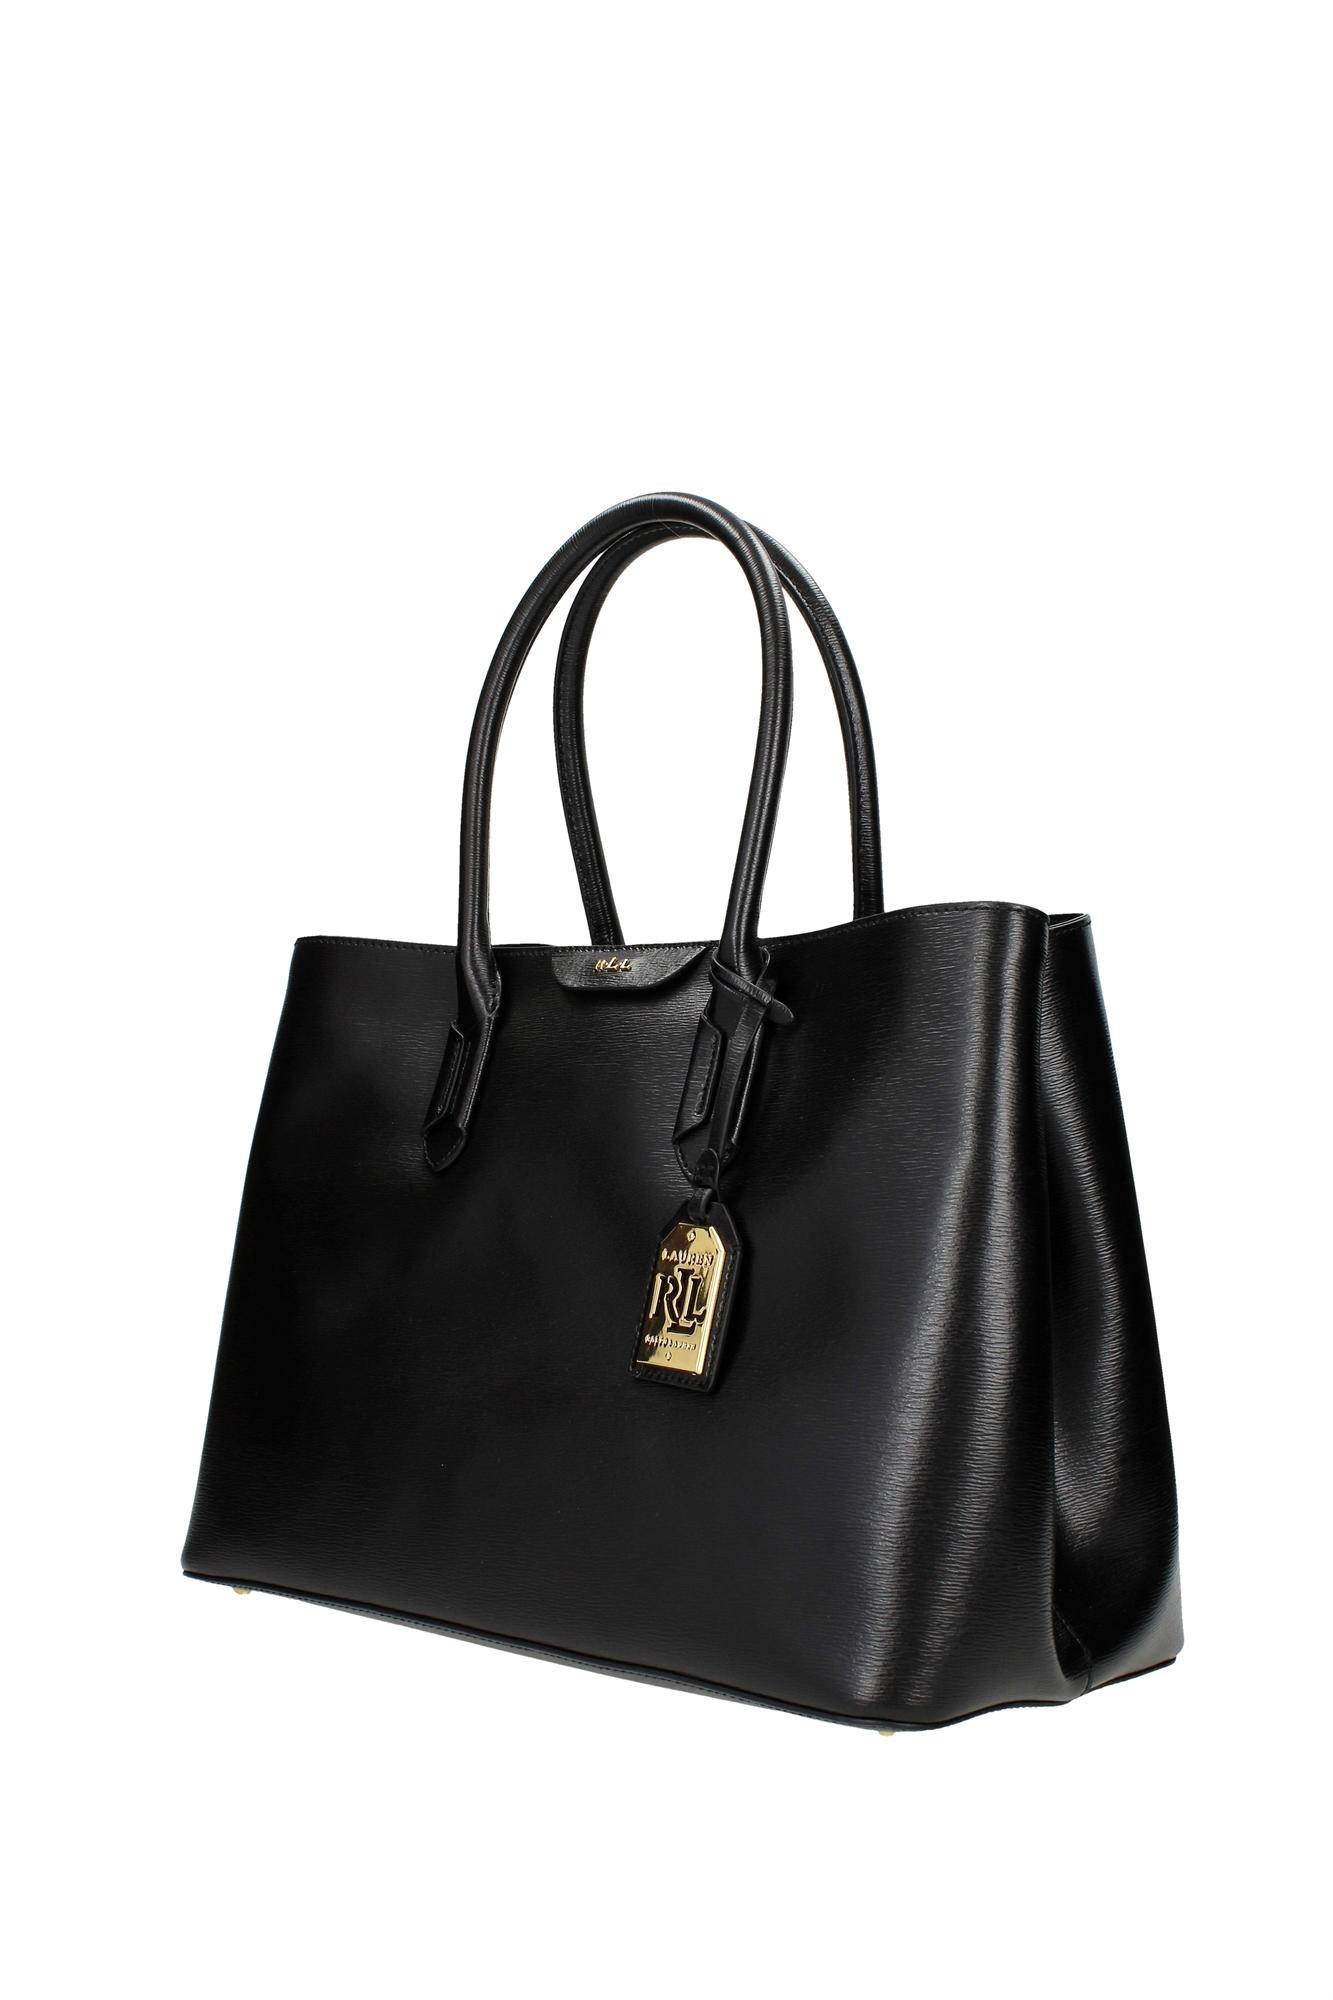 Cool   Shoes Amp Accessories Gt Women39s Handbags Amp Bags Gt Handb